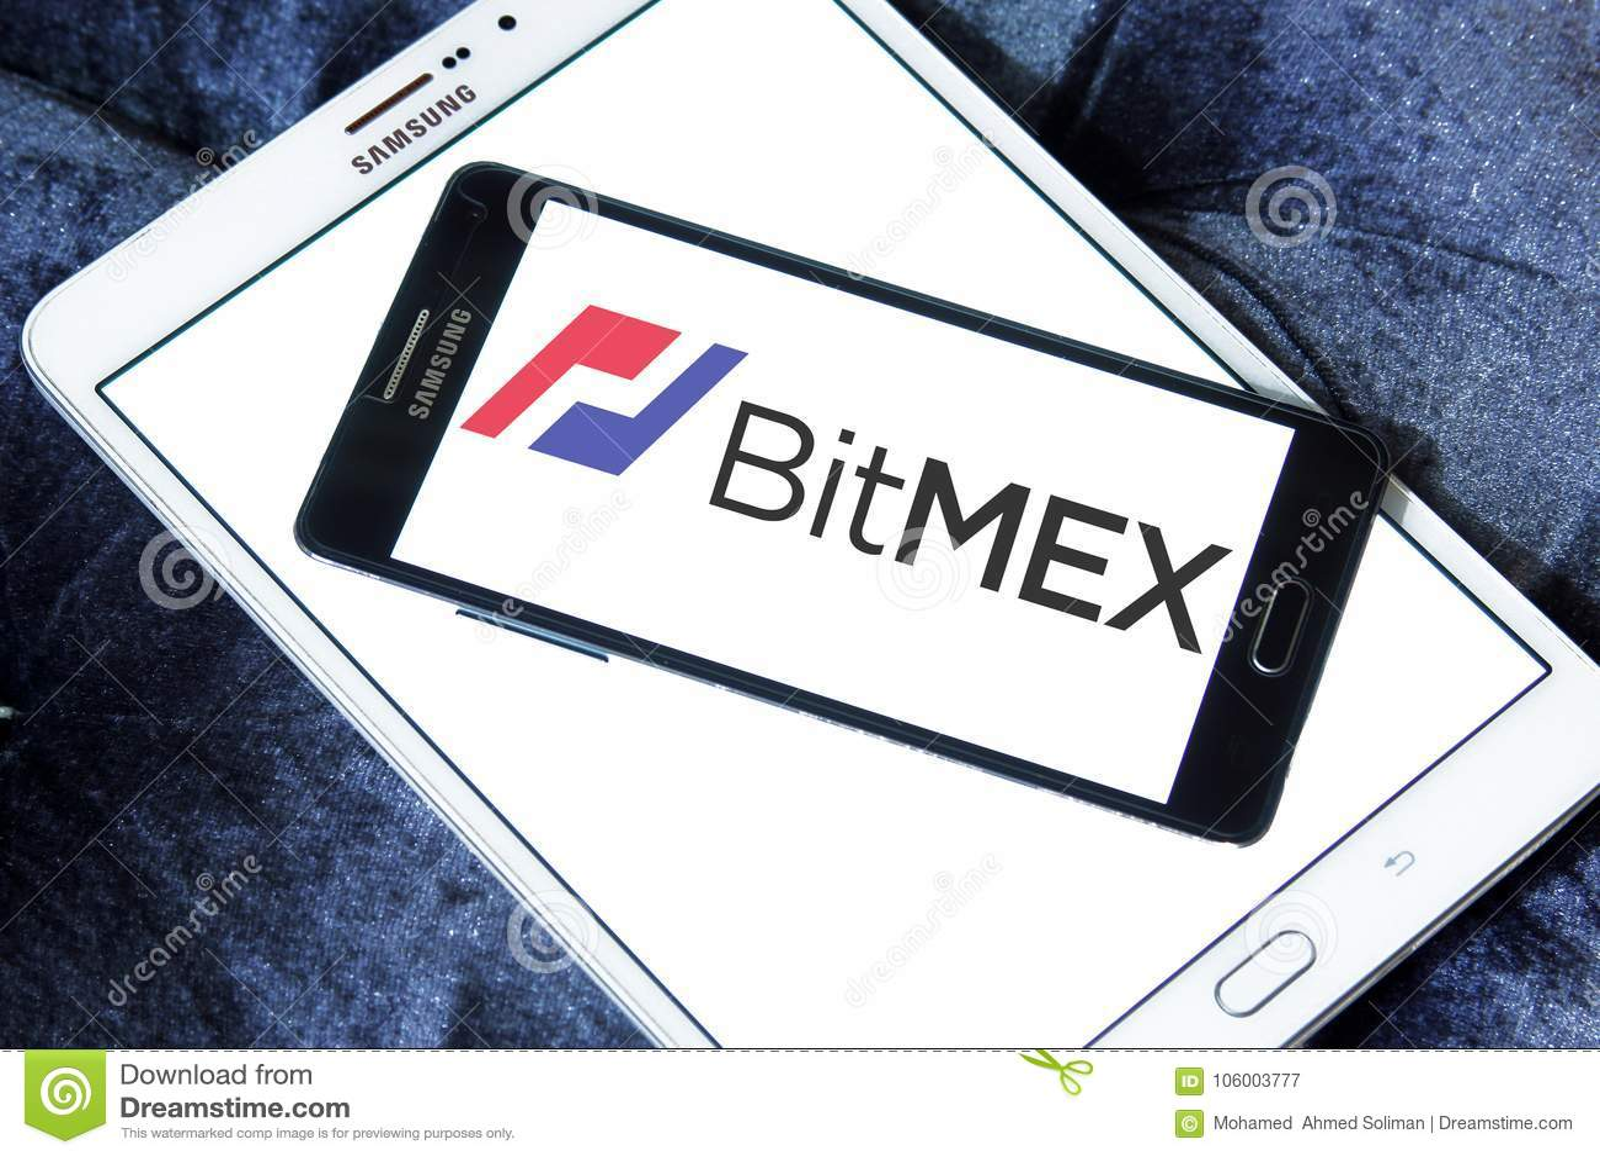 BitMEX Cryptocurrency Exchange Logo Editorial Photography - Image of